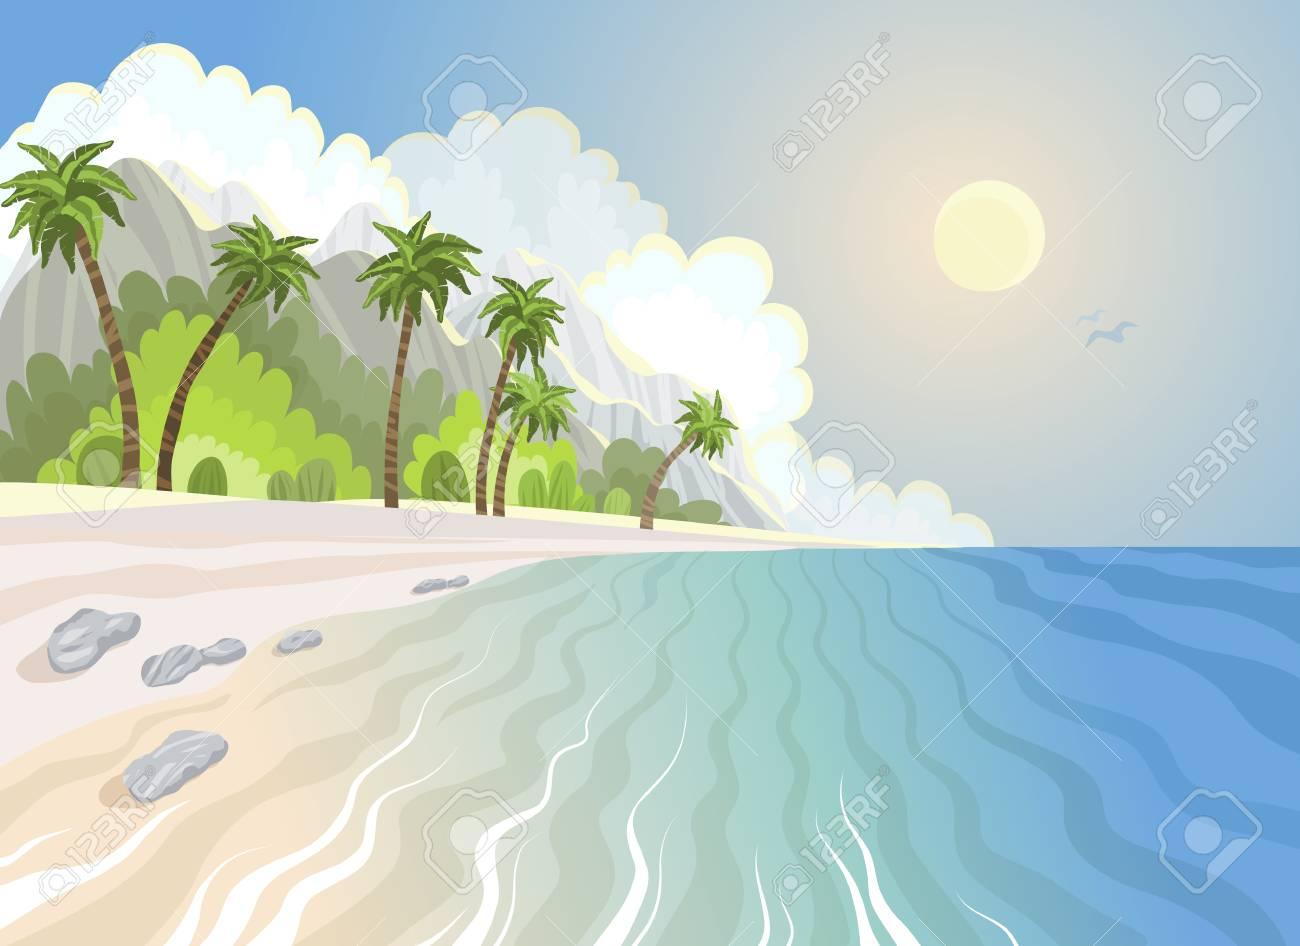 Summer paradise beach and palm trees at seashore, tropical vector illustration. - 125230045